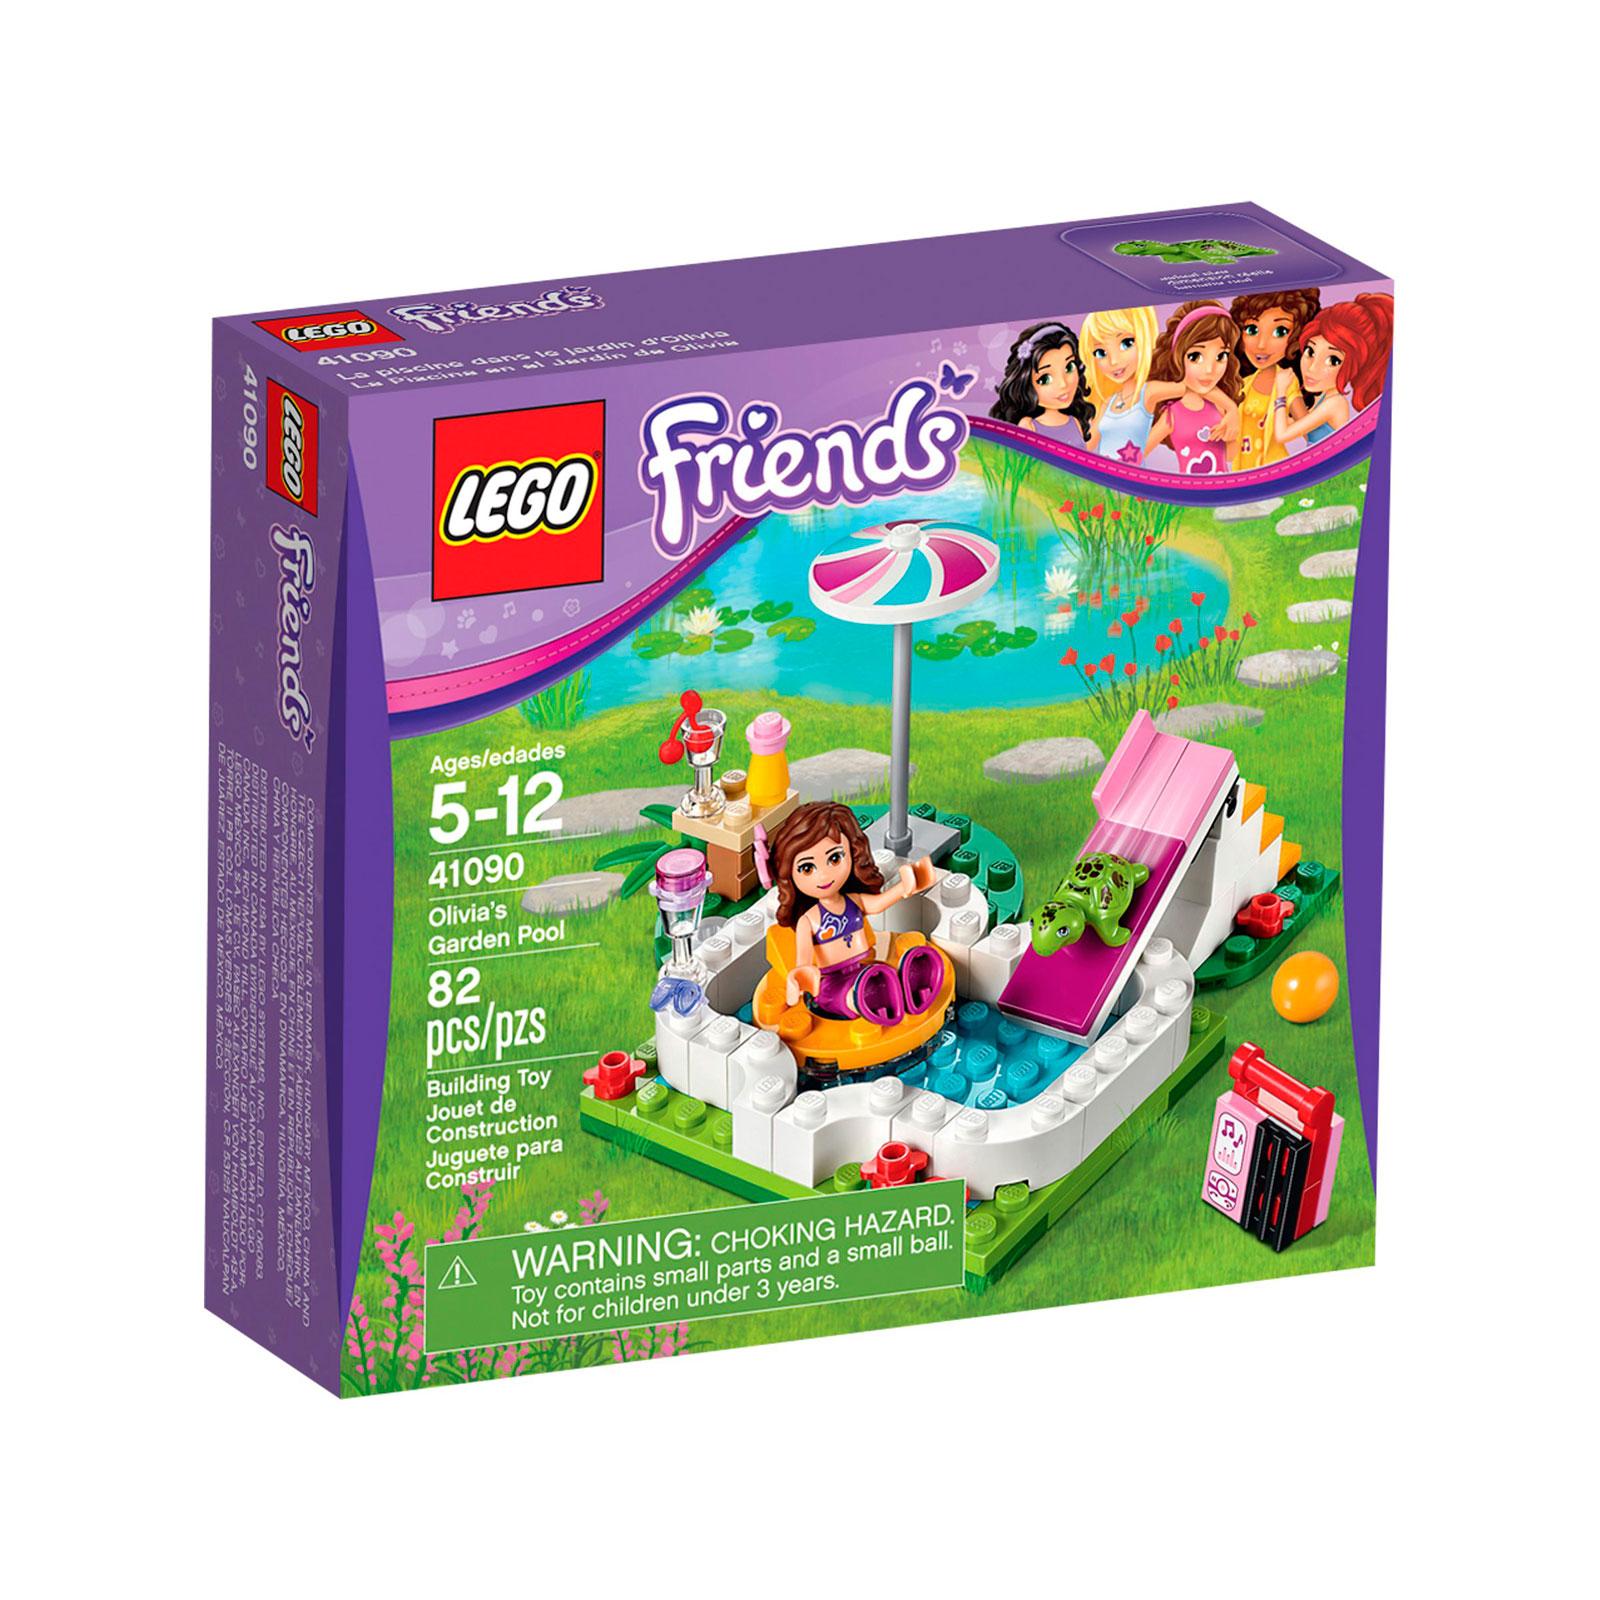 ����������� LEGO Friends 41090 ��������� ������� ������